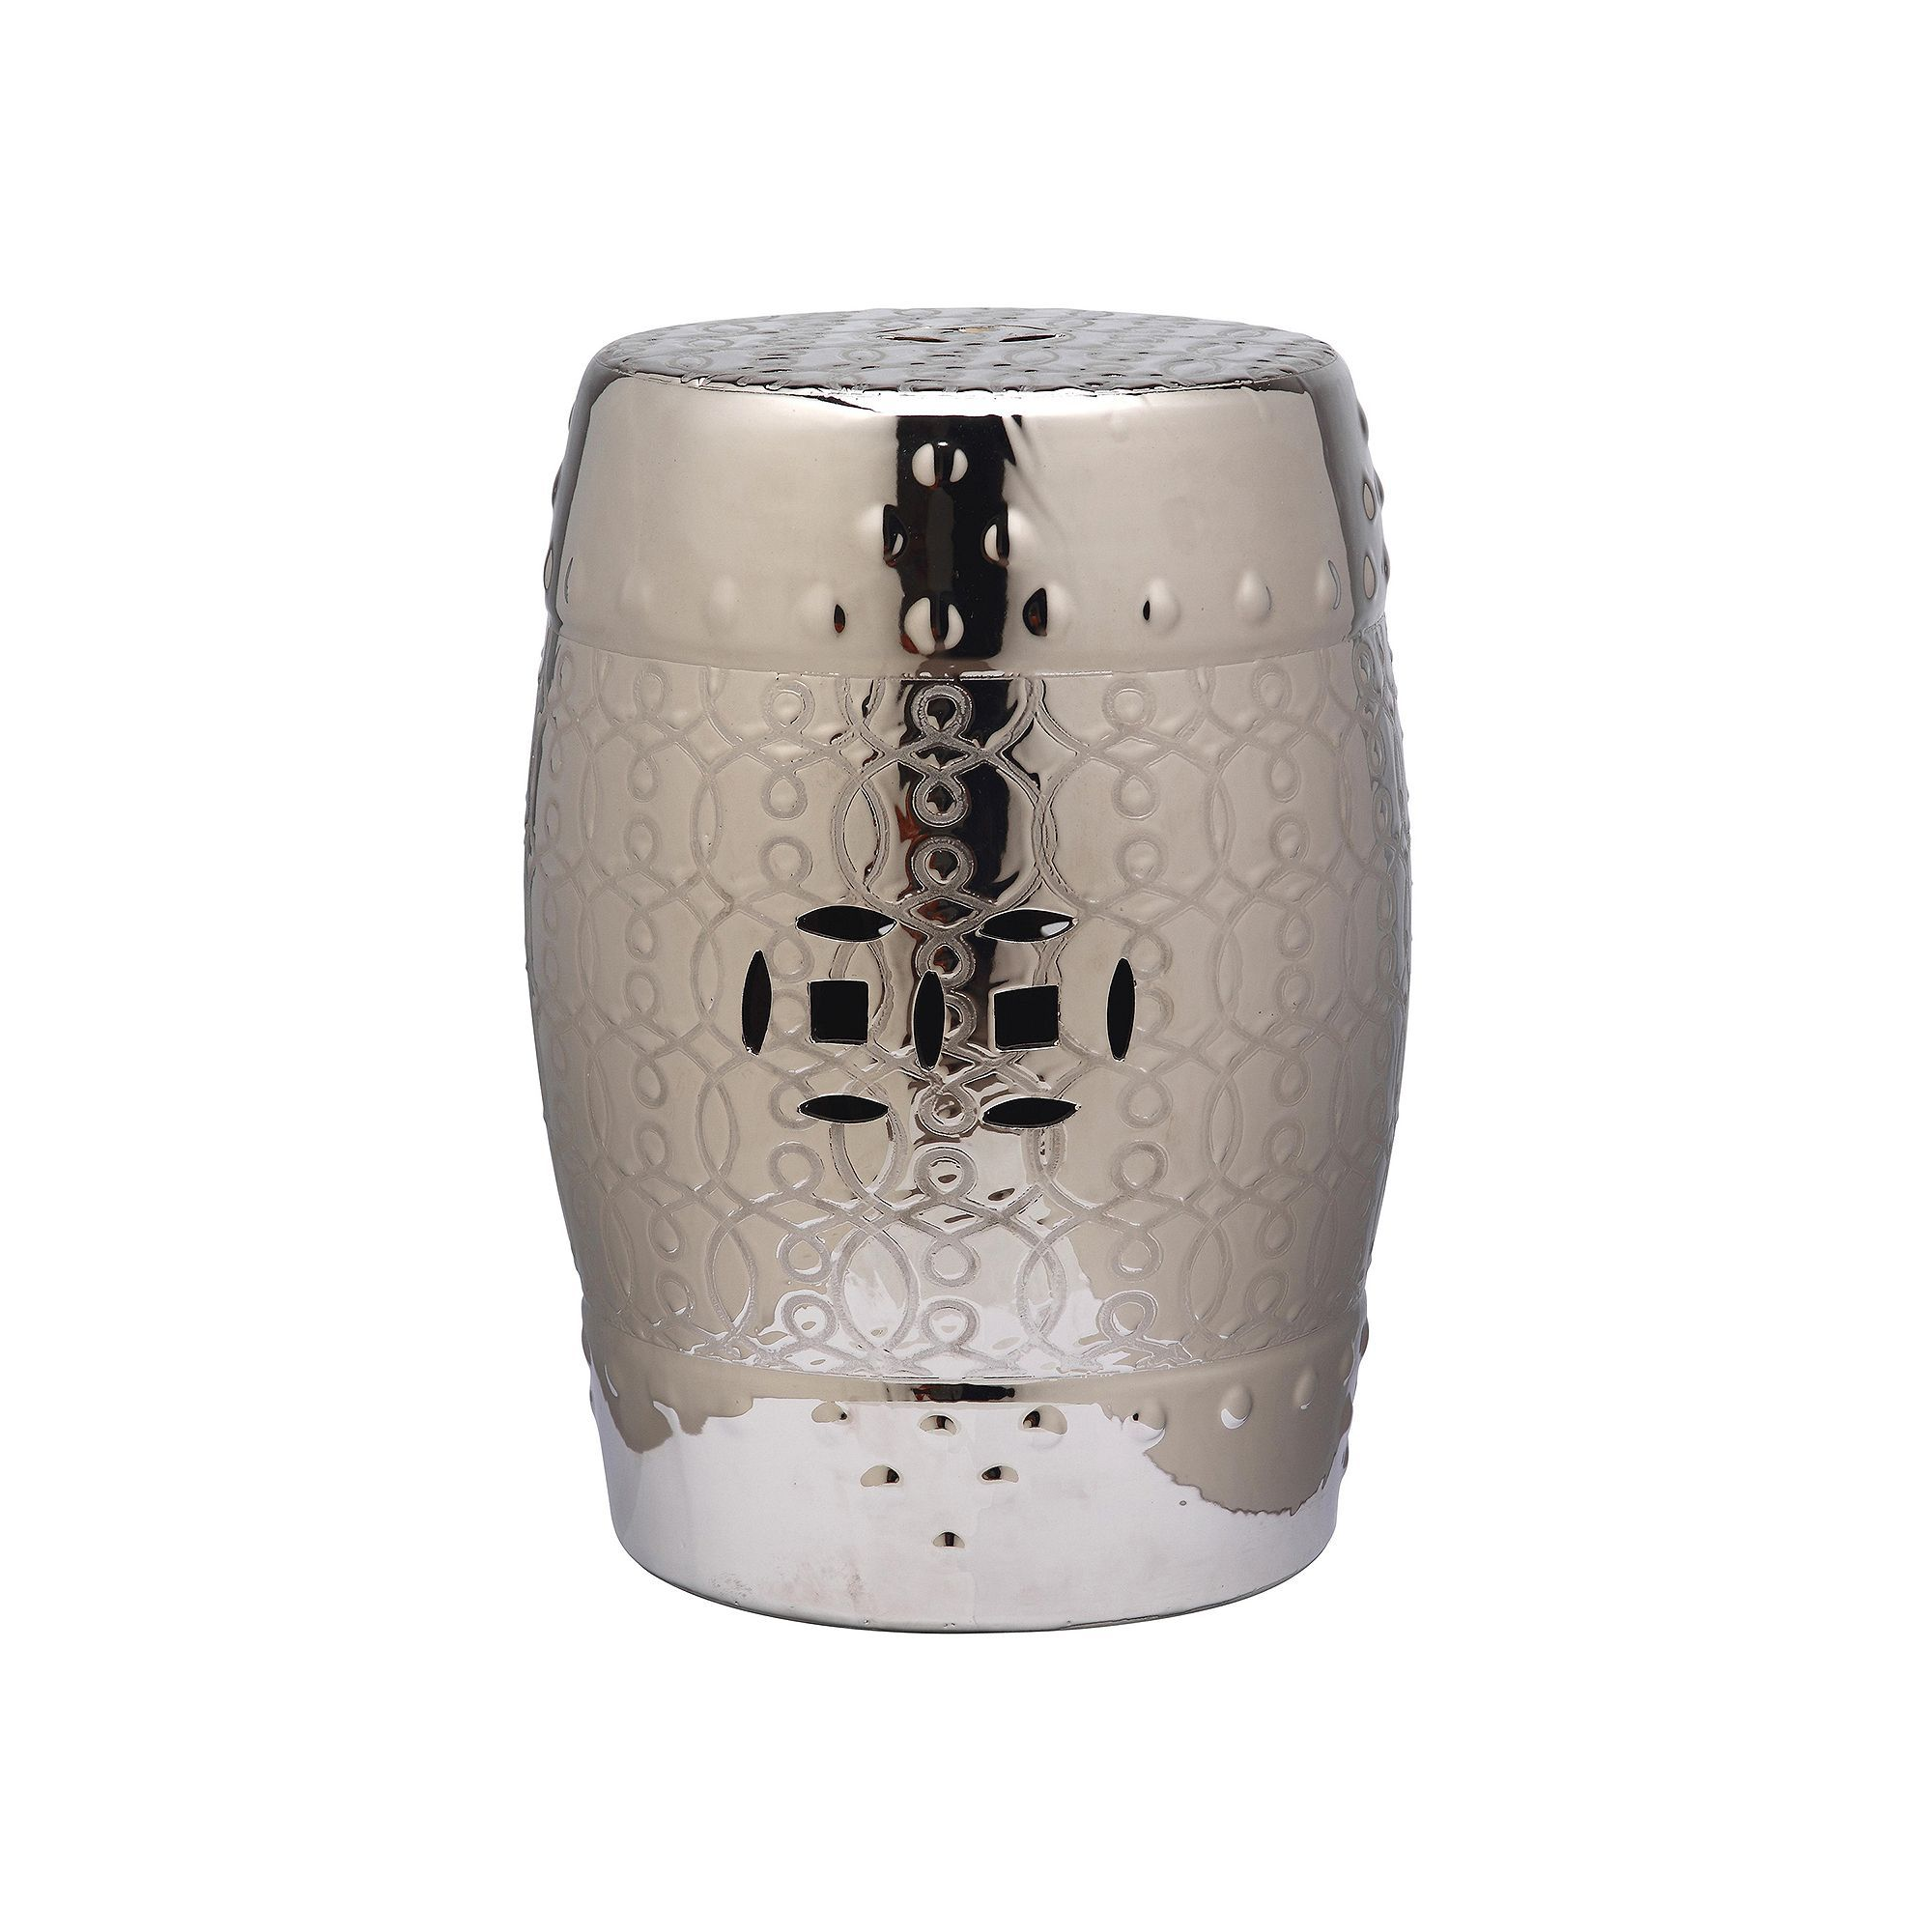 Astonishing Safavieh Lantana Ceramic Garden Stool Silver Furniture In Ncnpc Chair Design For Home Ncnpcorg